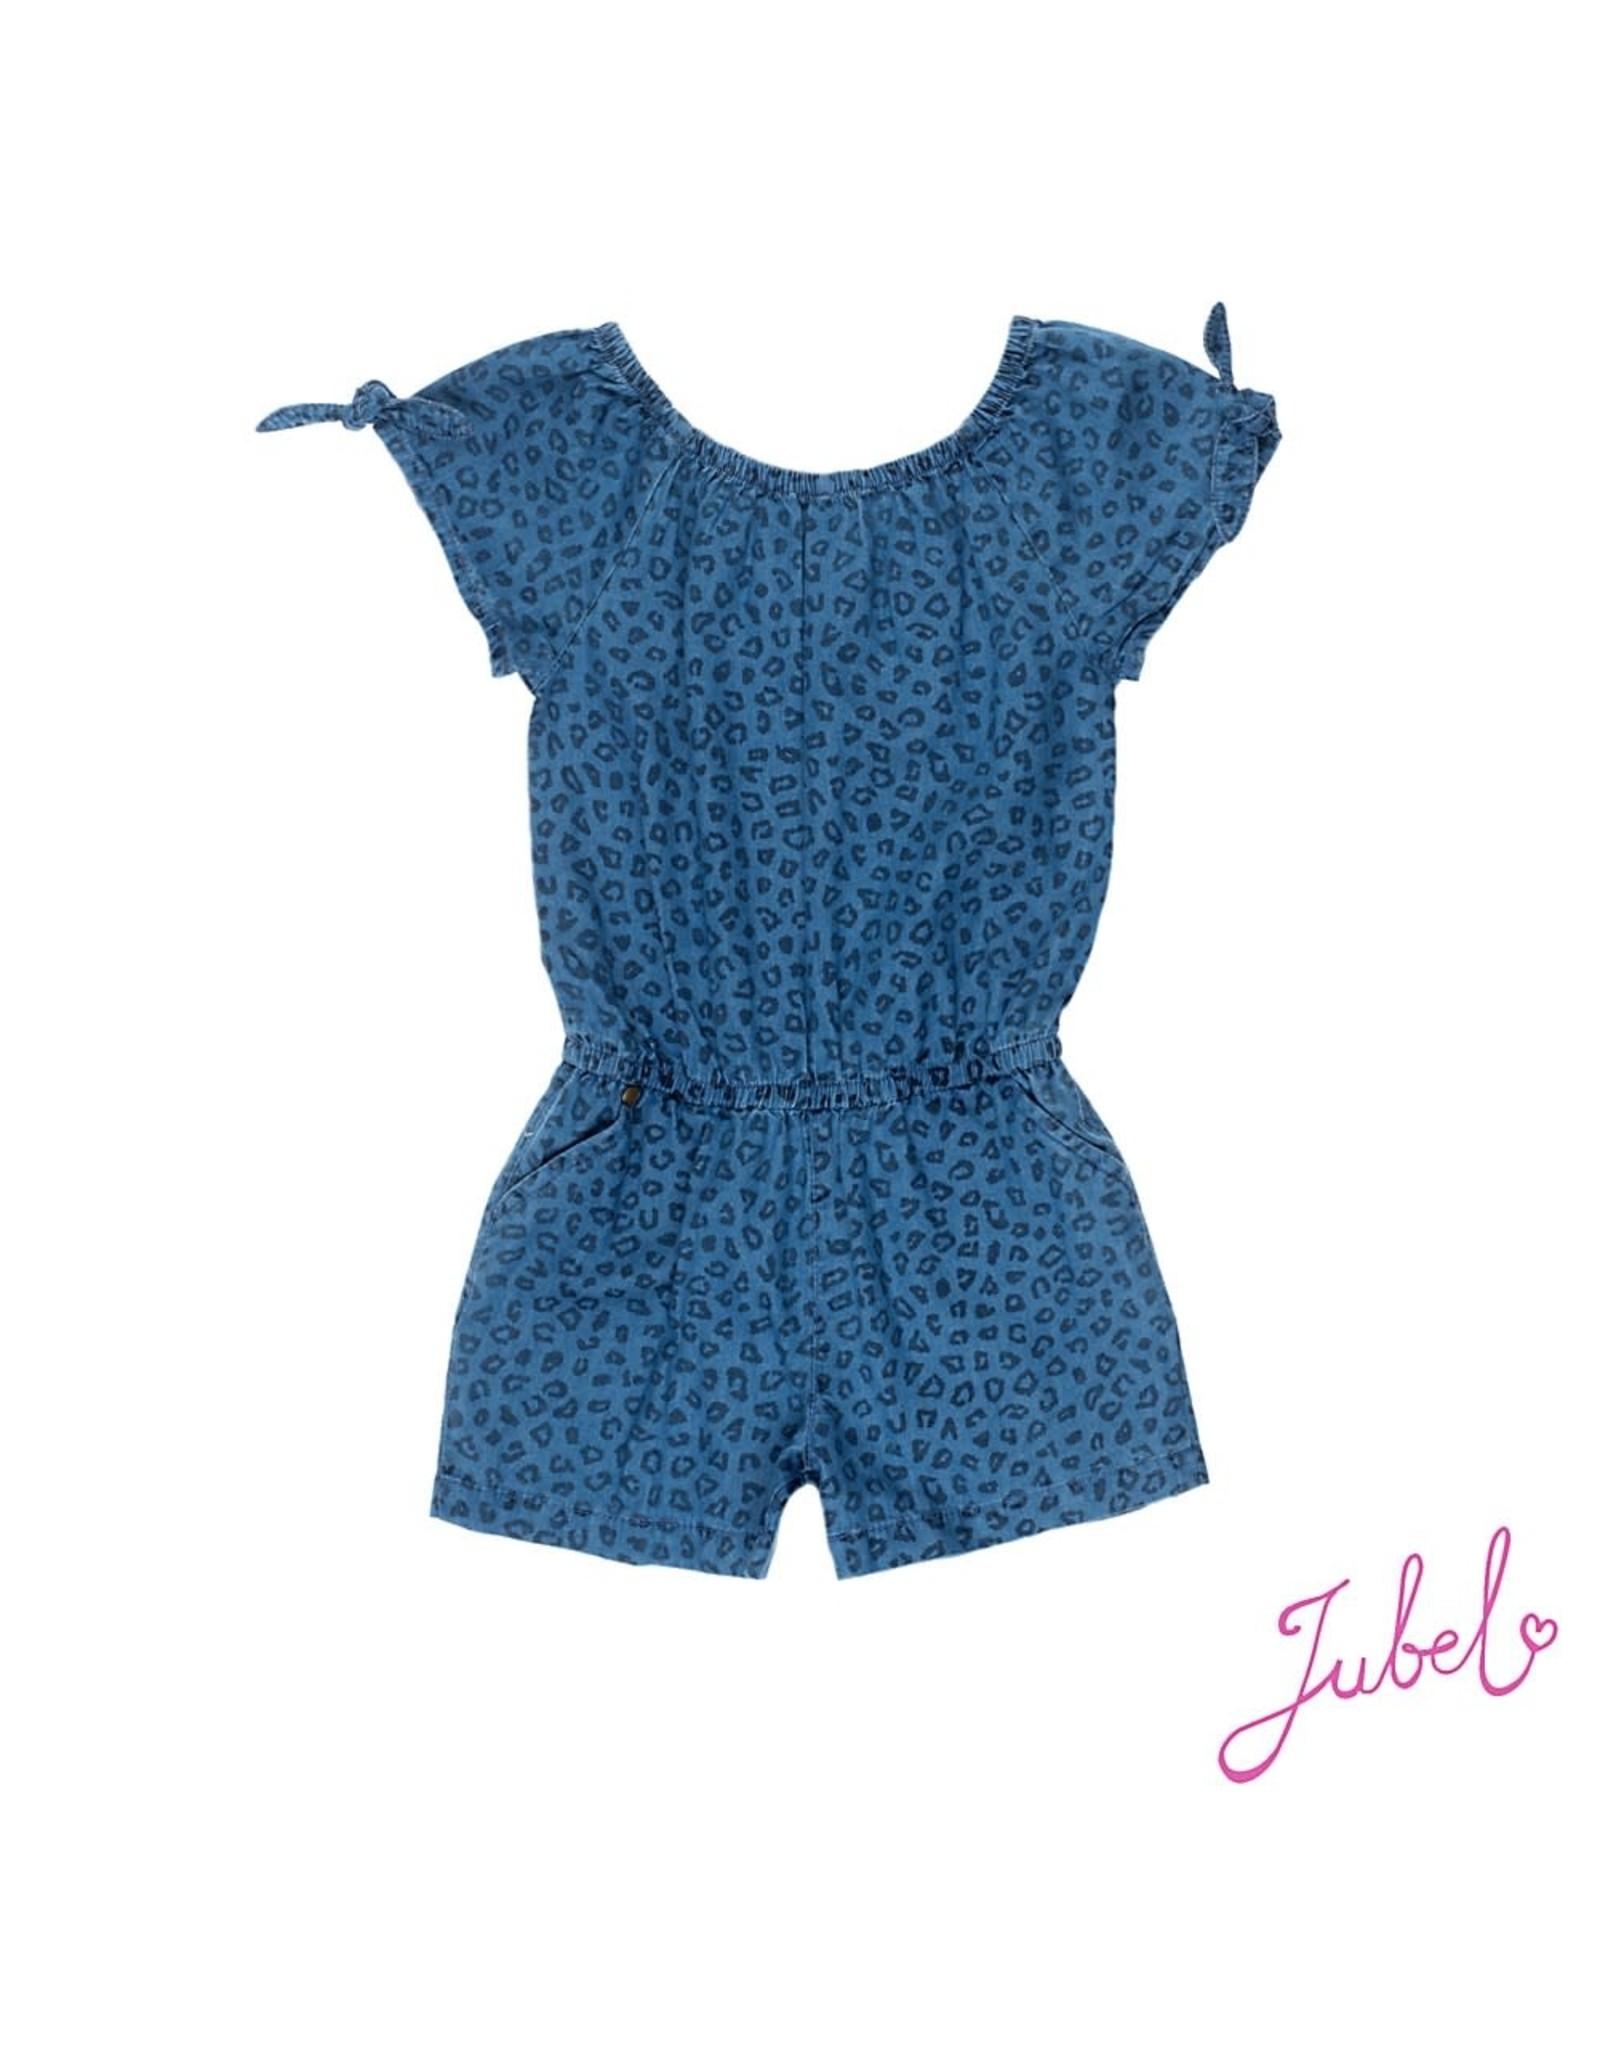 Jubel Denim playsuit AOP - Summer Denims Blue denim